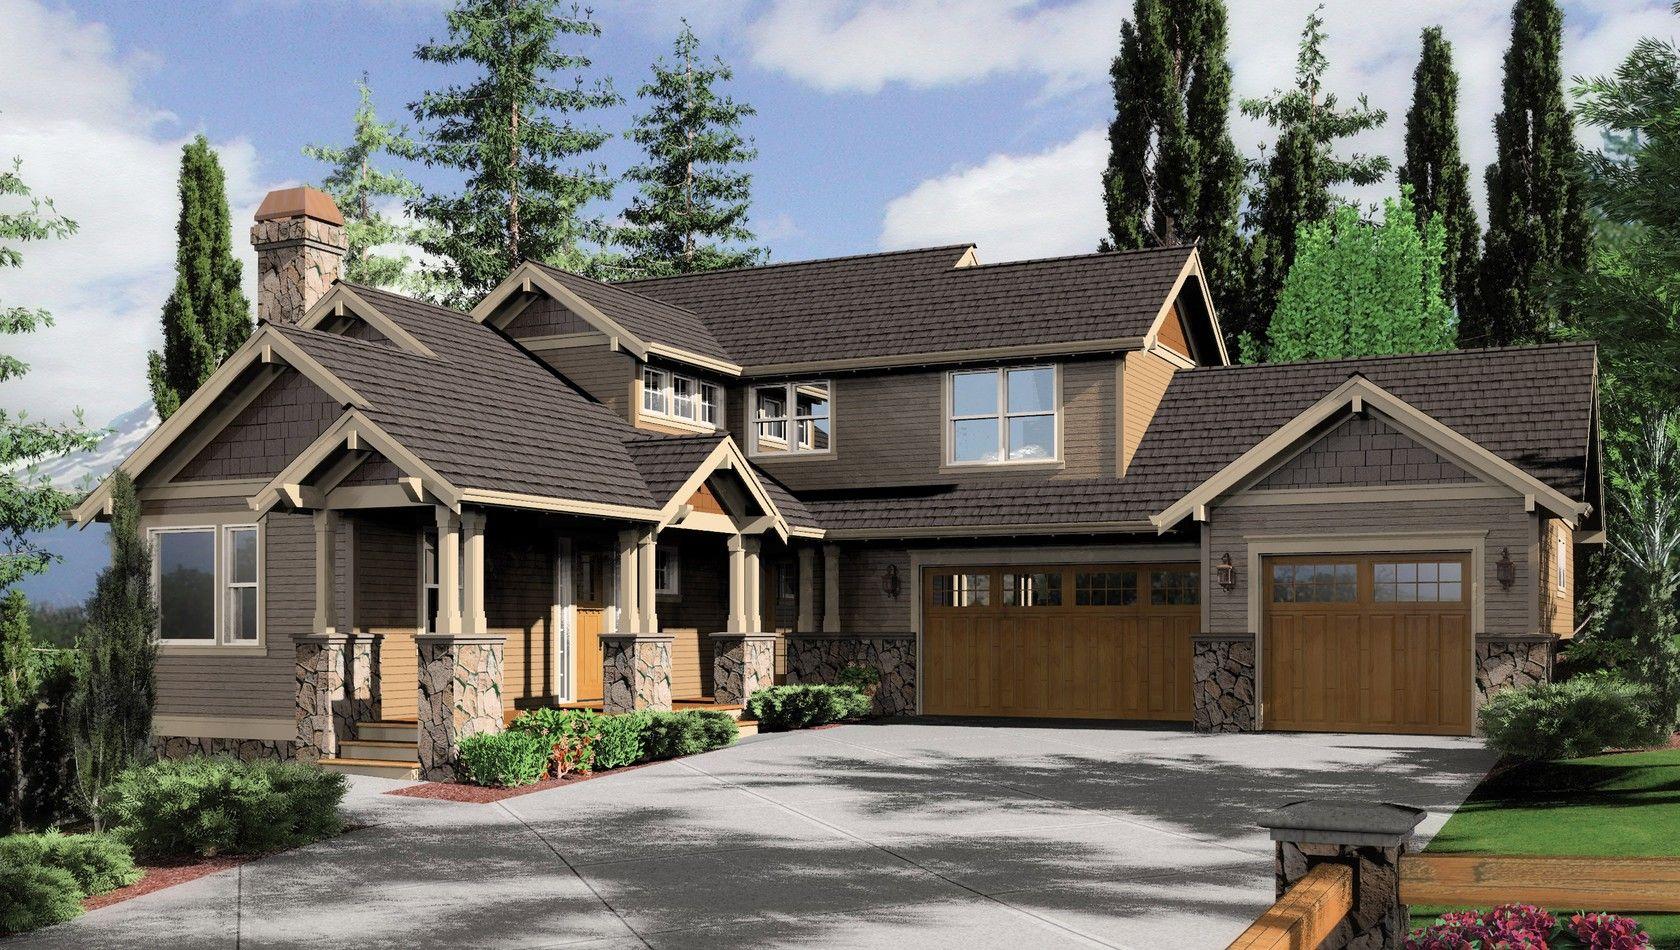 Inspirational Craftsman House Plans Daylight Basement